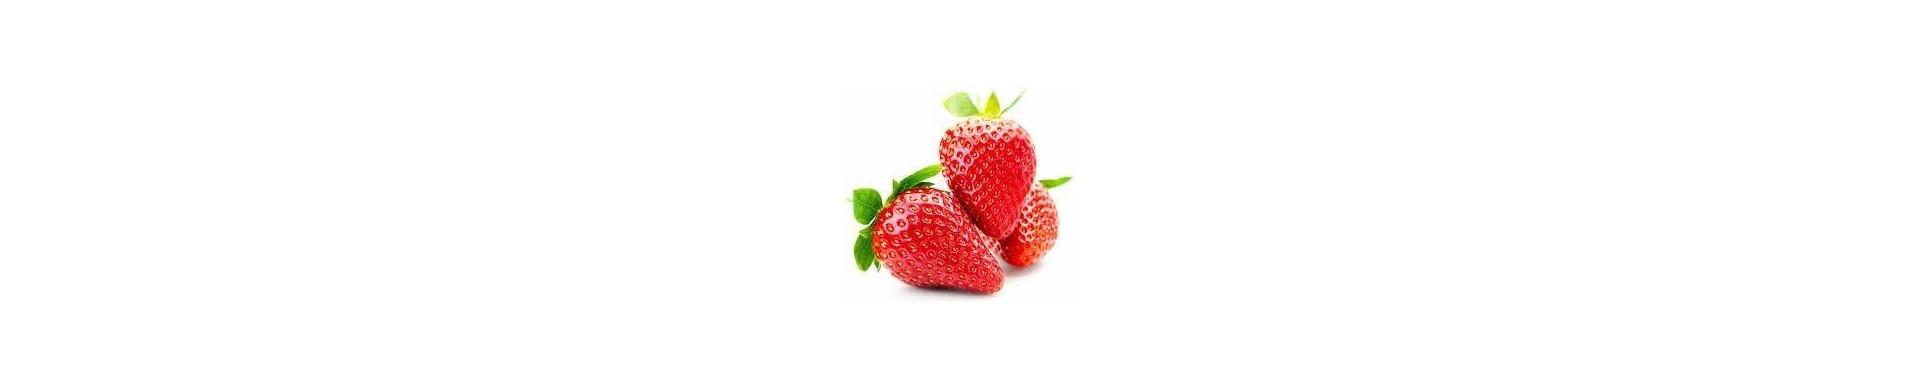 Plantar fresas - Comprar plantas de fresas